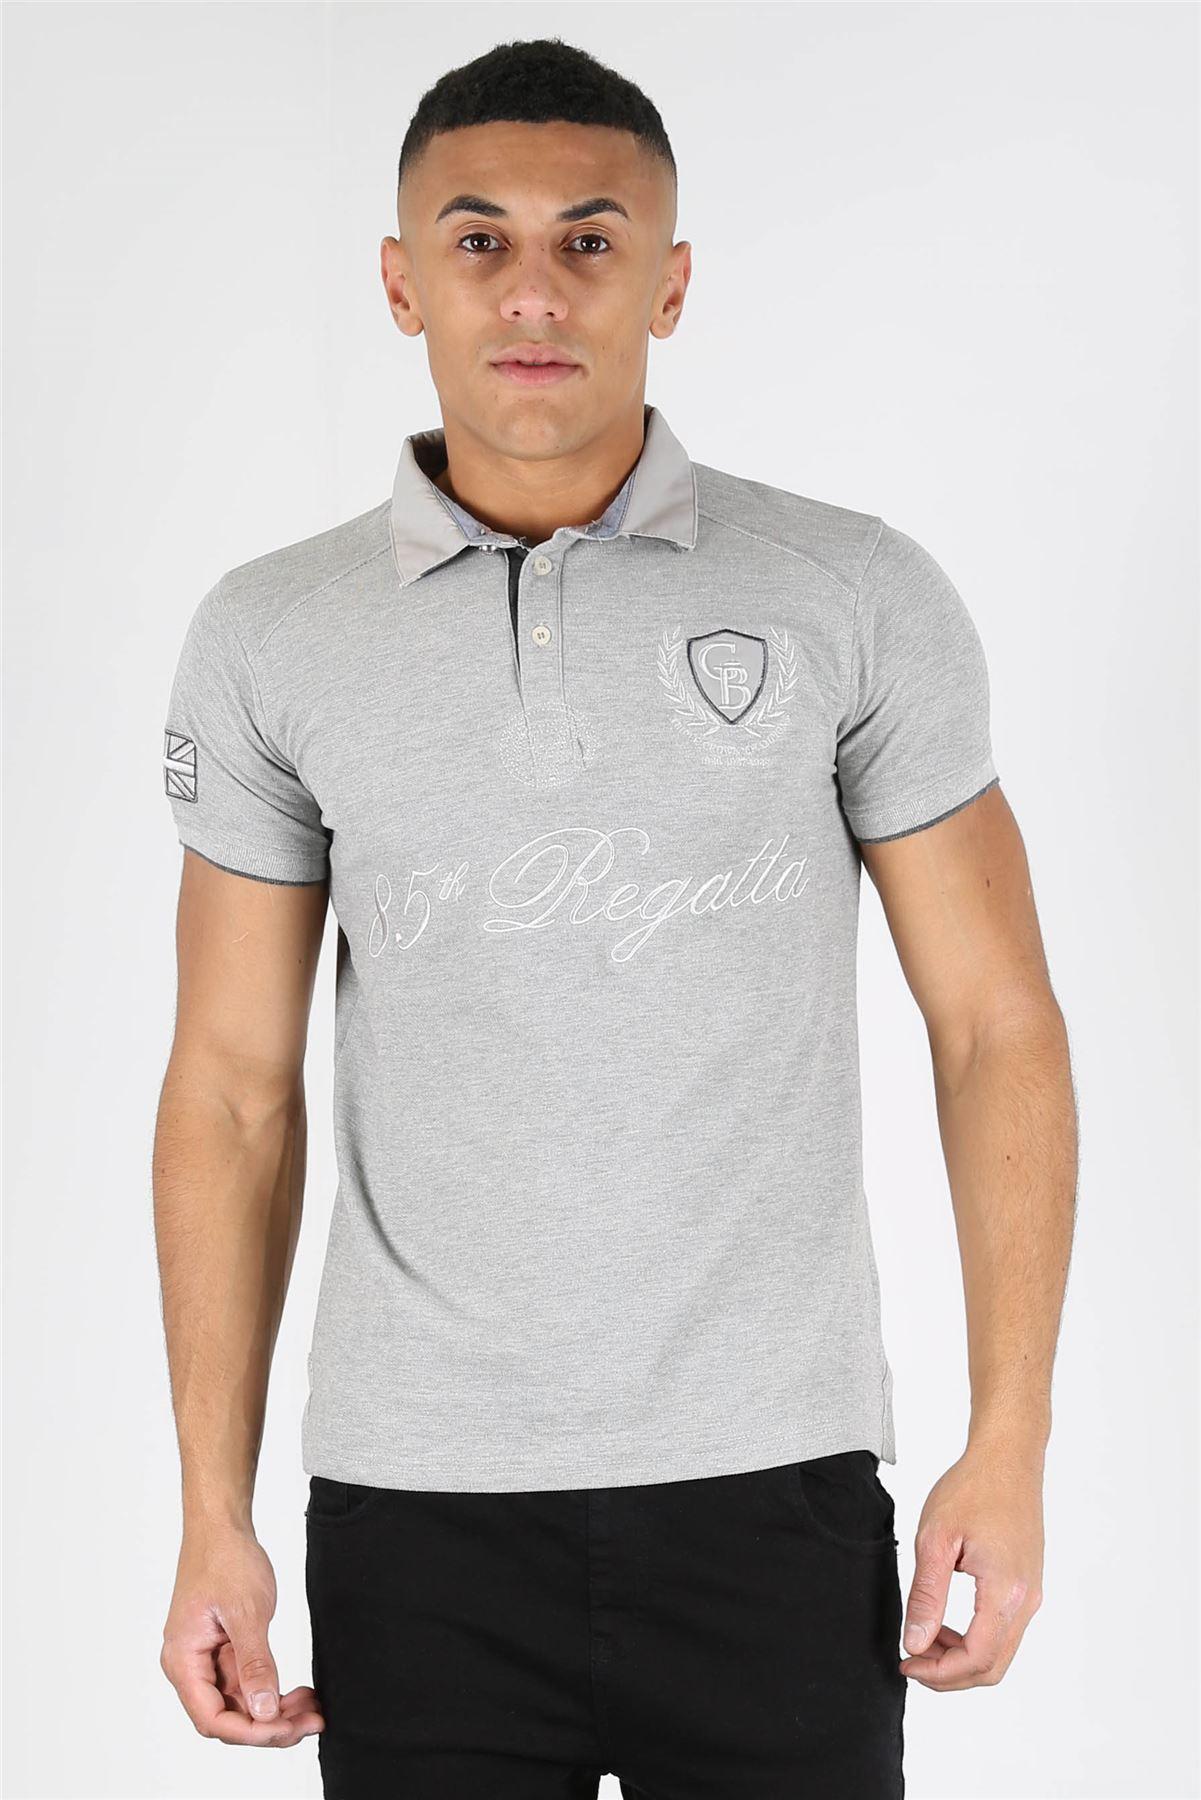 Mens designer slimster london 3 button placket 85 regatta for 3 button polo shirts